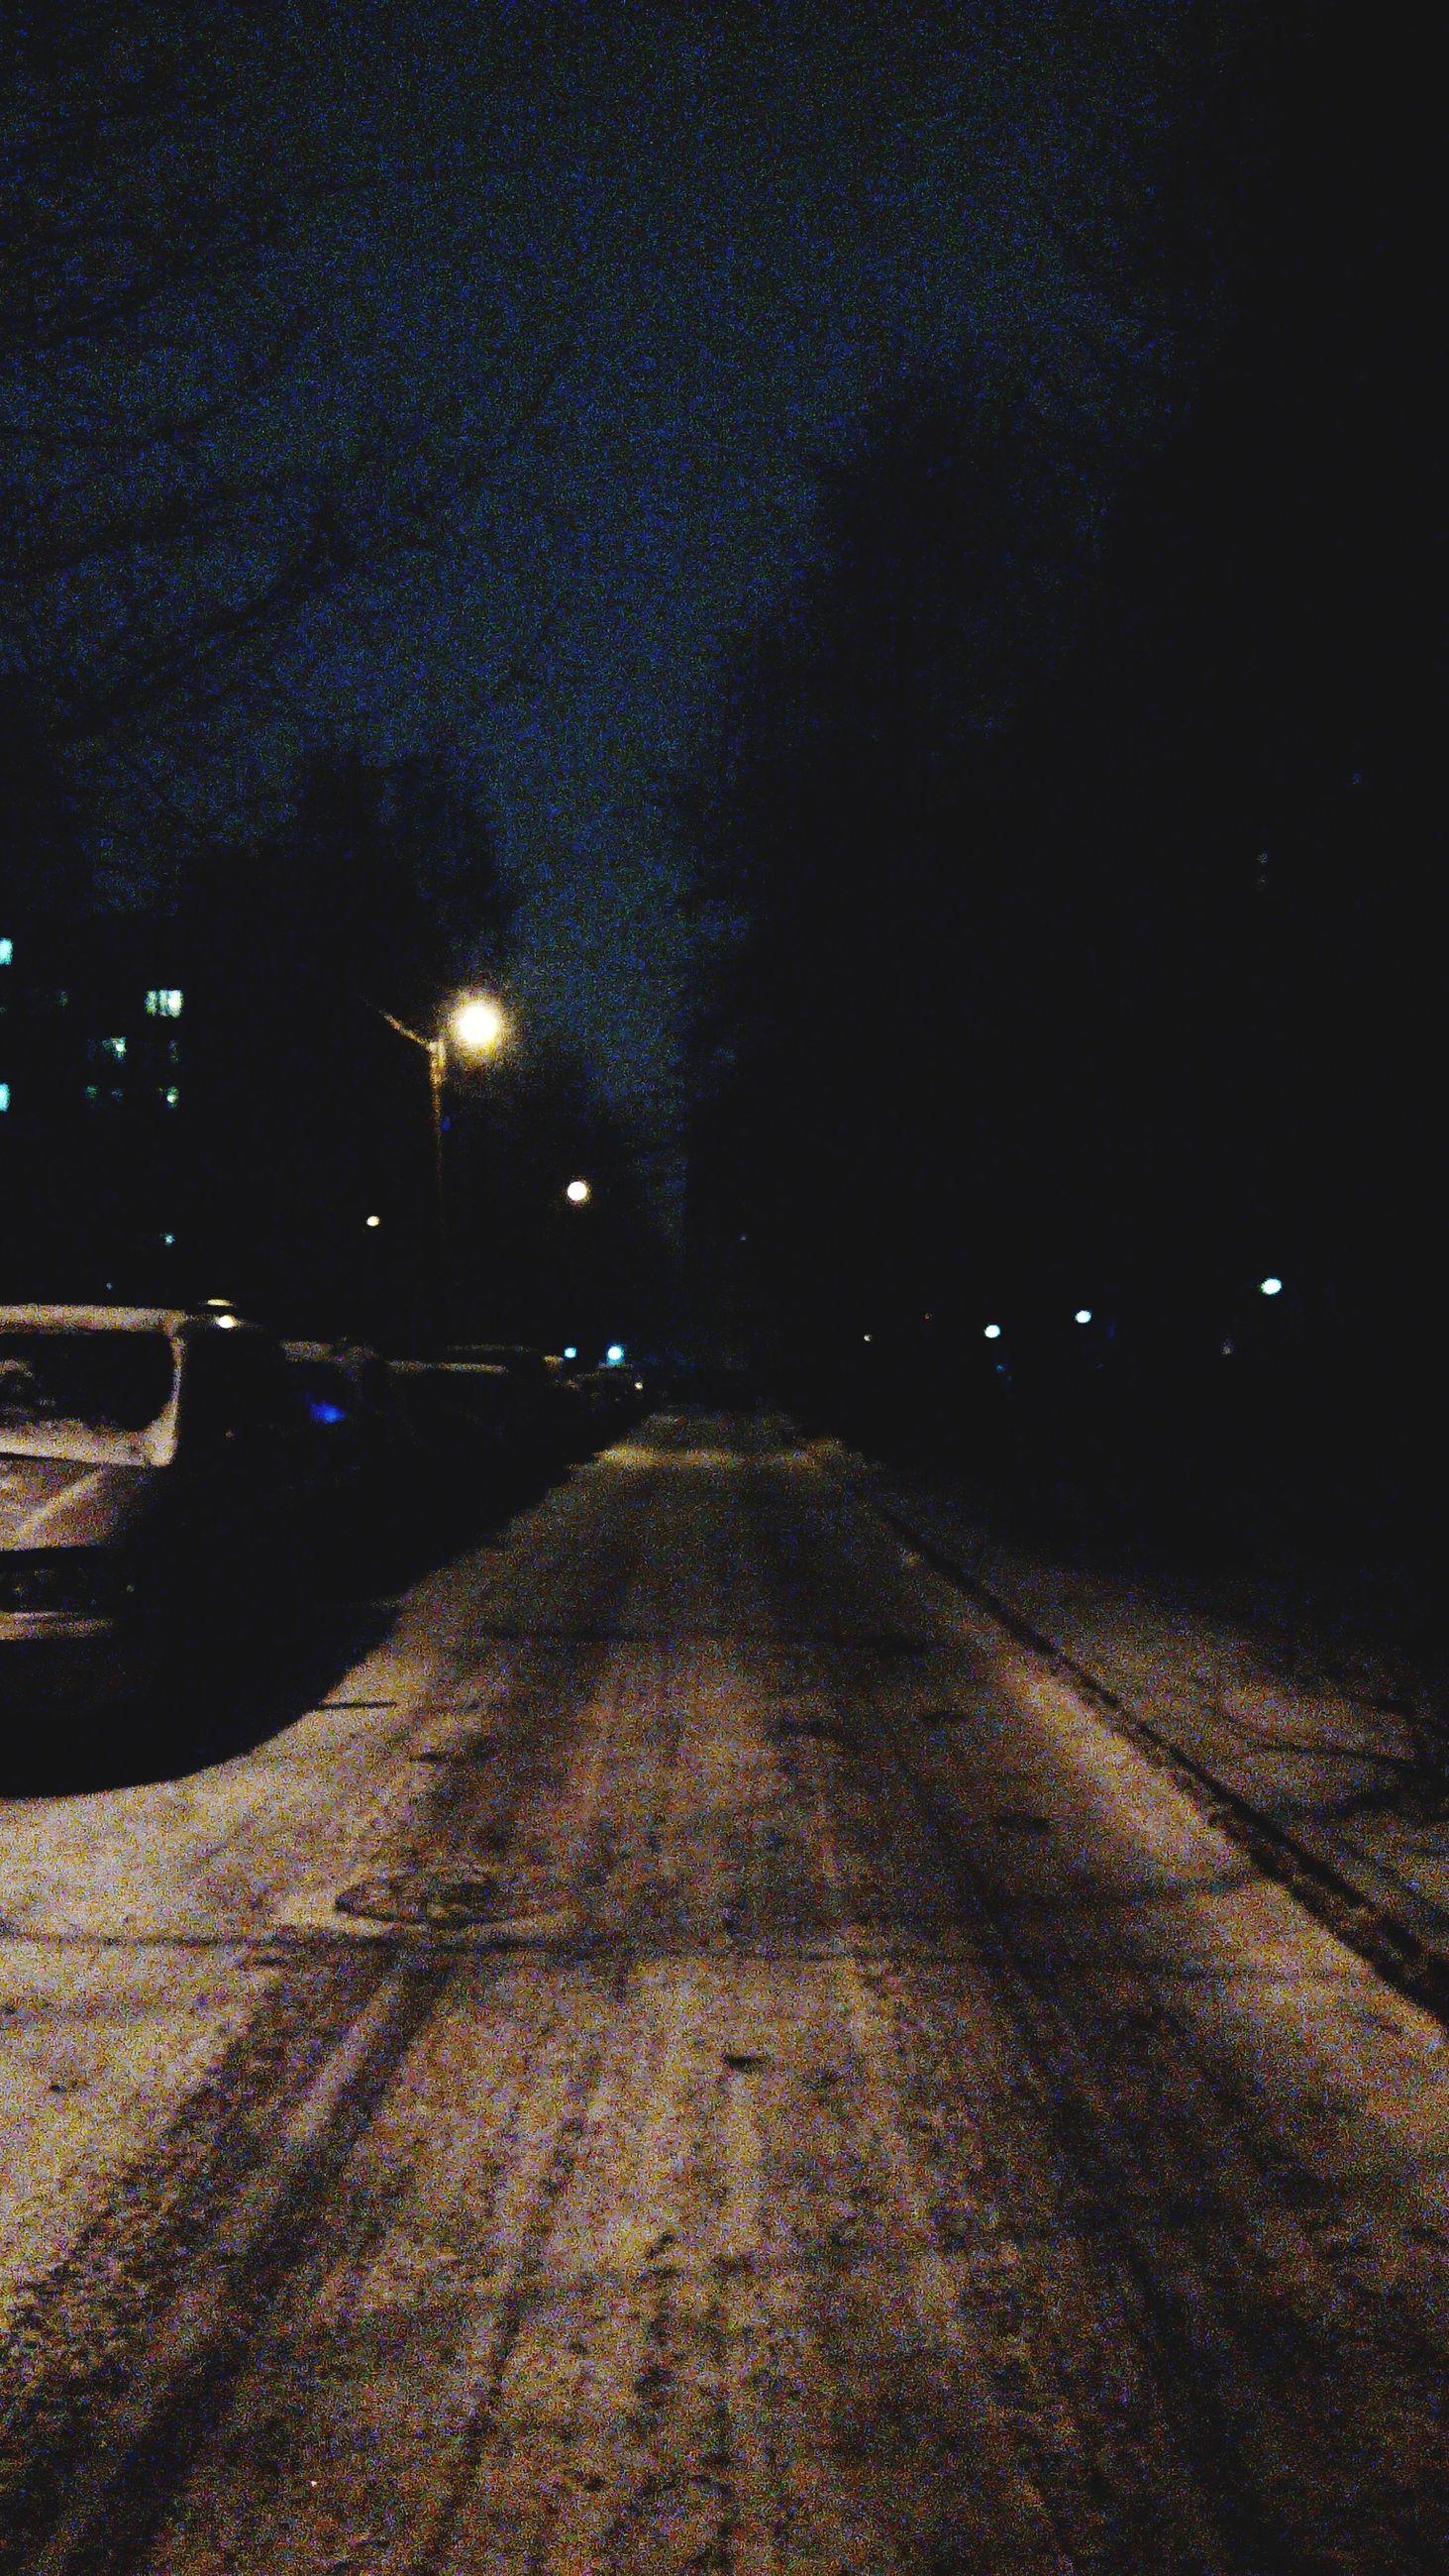 night, the way forward, illuminated, road, street, transportation, diminishing perspective, vanishing point, street light, dark, empty road, sky, long, outdoors, empty, no people, lighting equipment, asphalt, surface level, tranquility